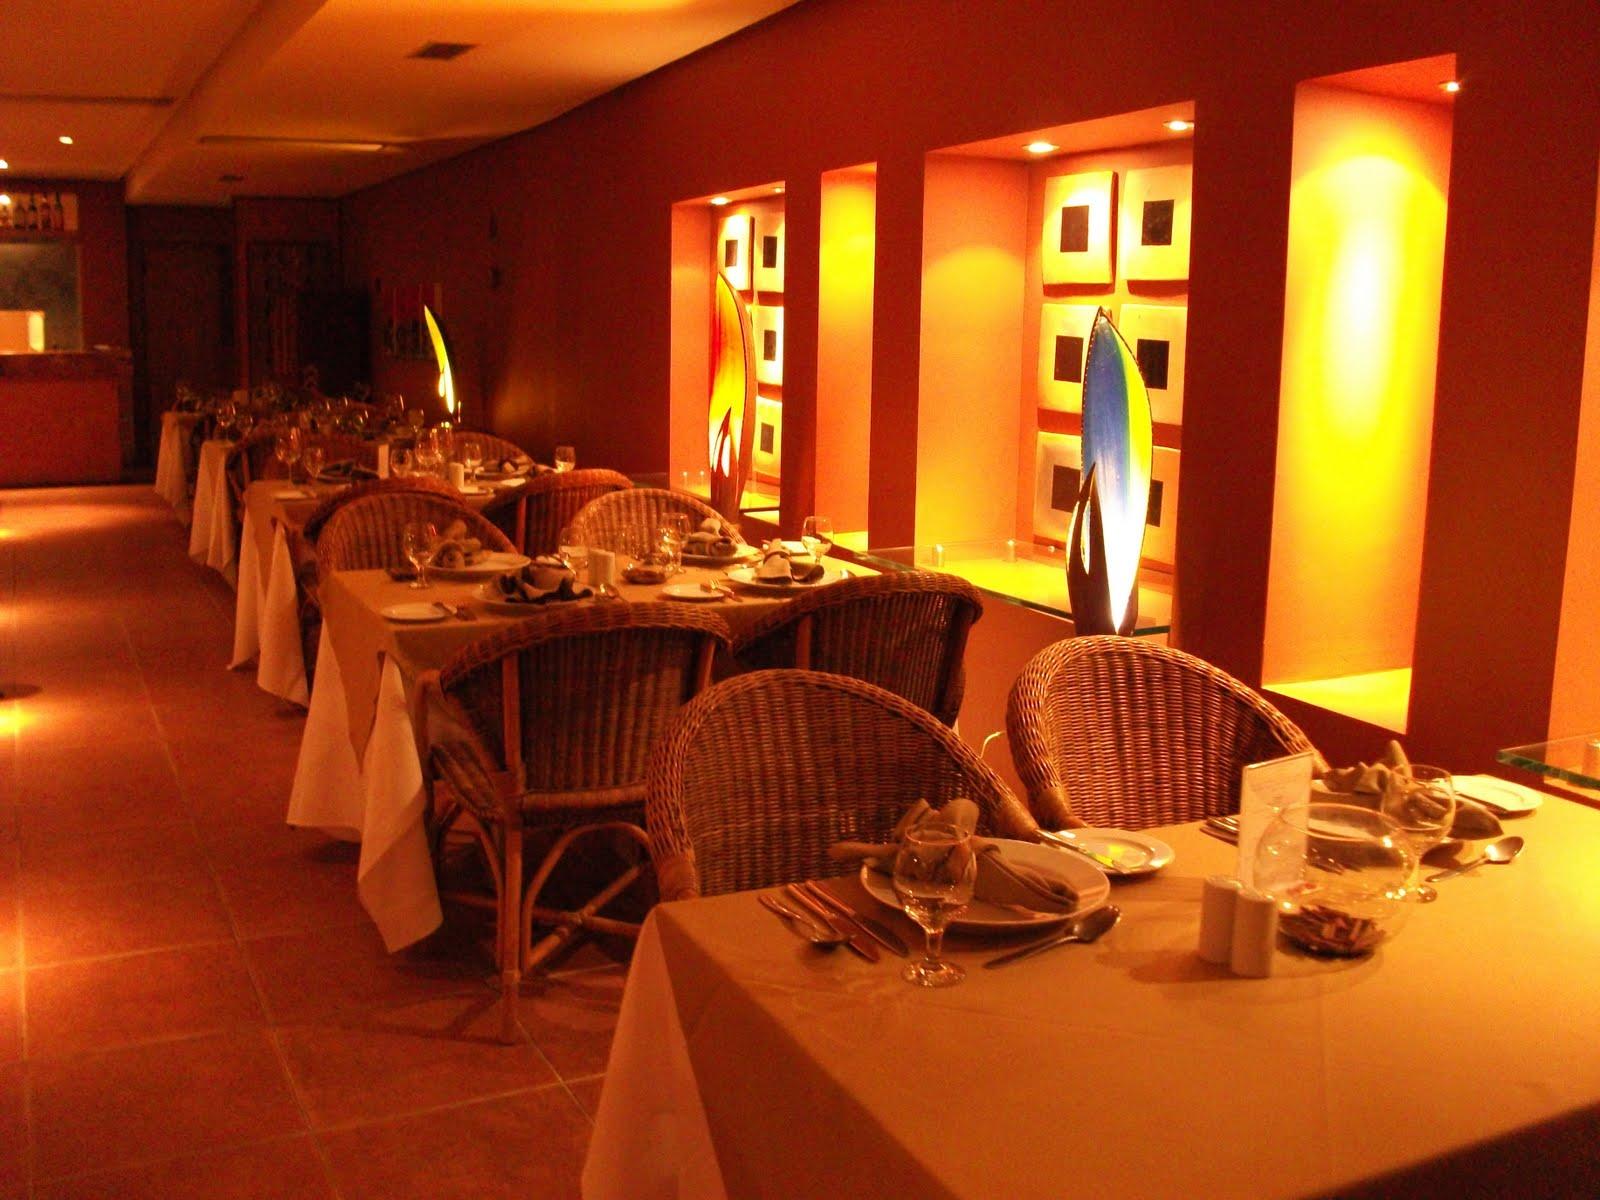 Juliano S Restaurant Catering Mckees Rocks Pa